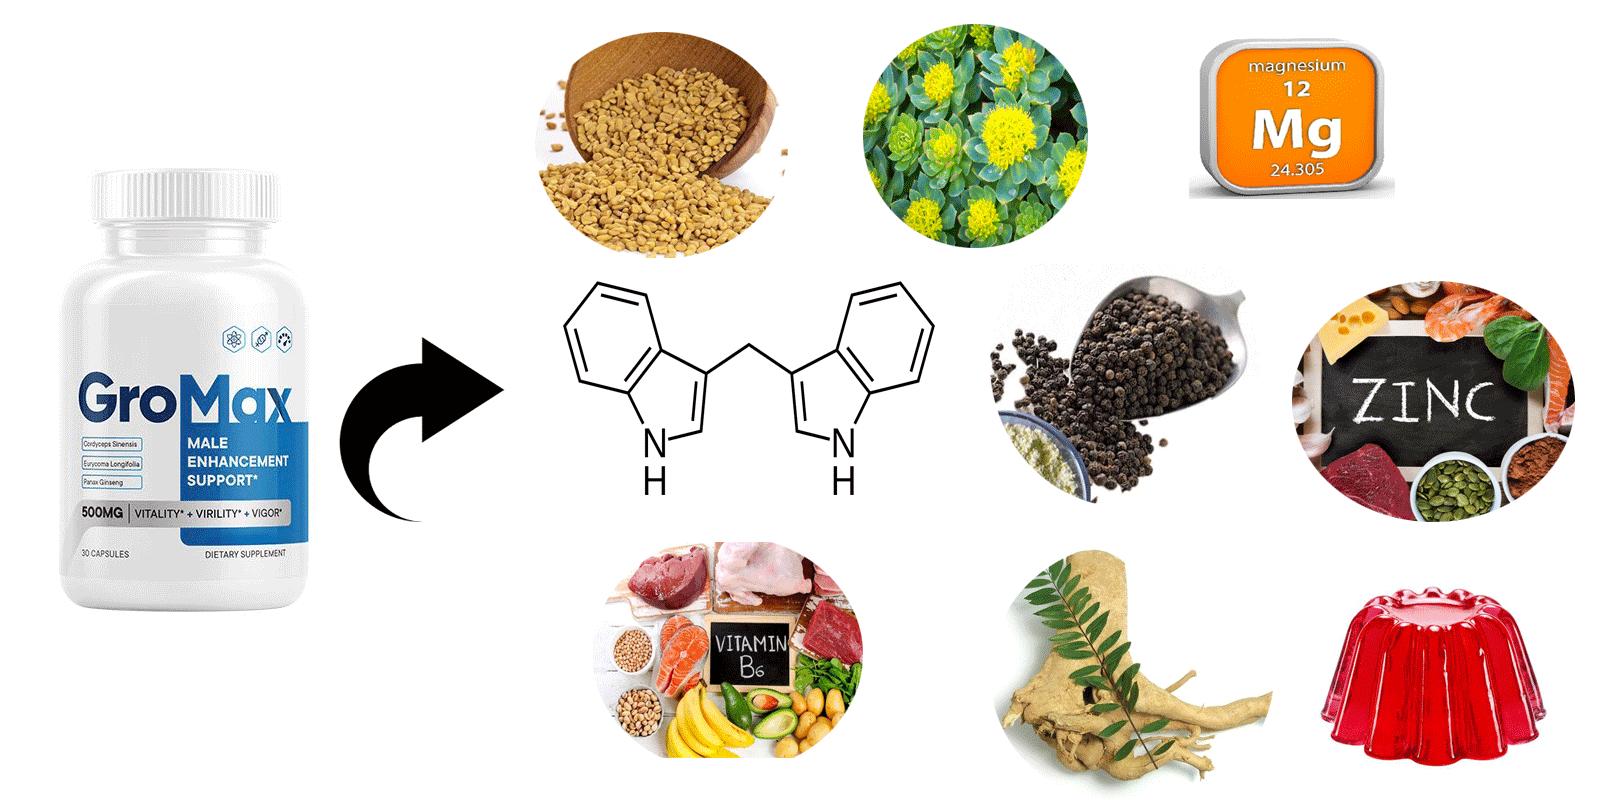 GroMax Male Enhancement Supplement Ingredients